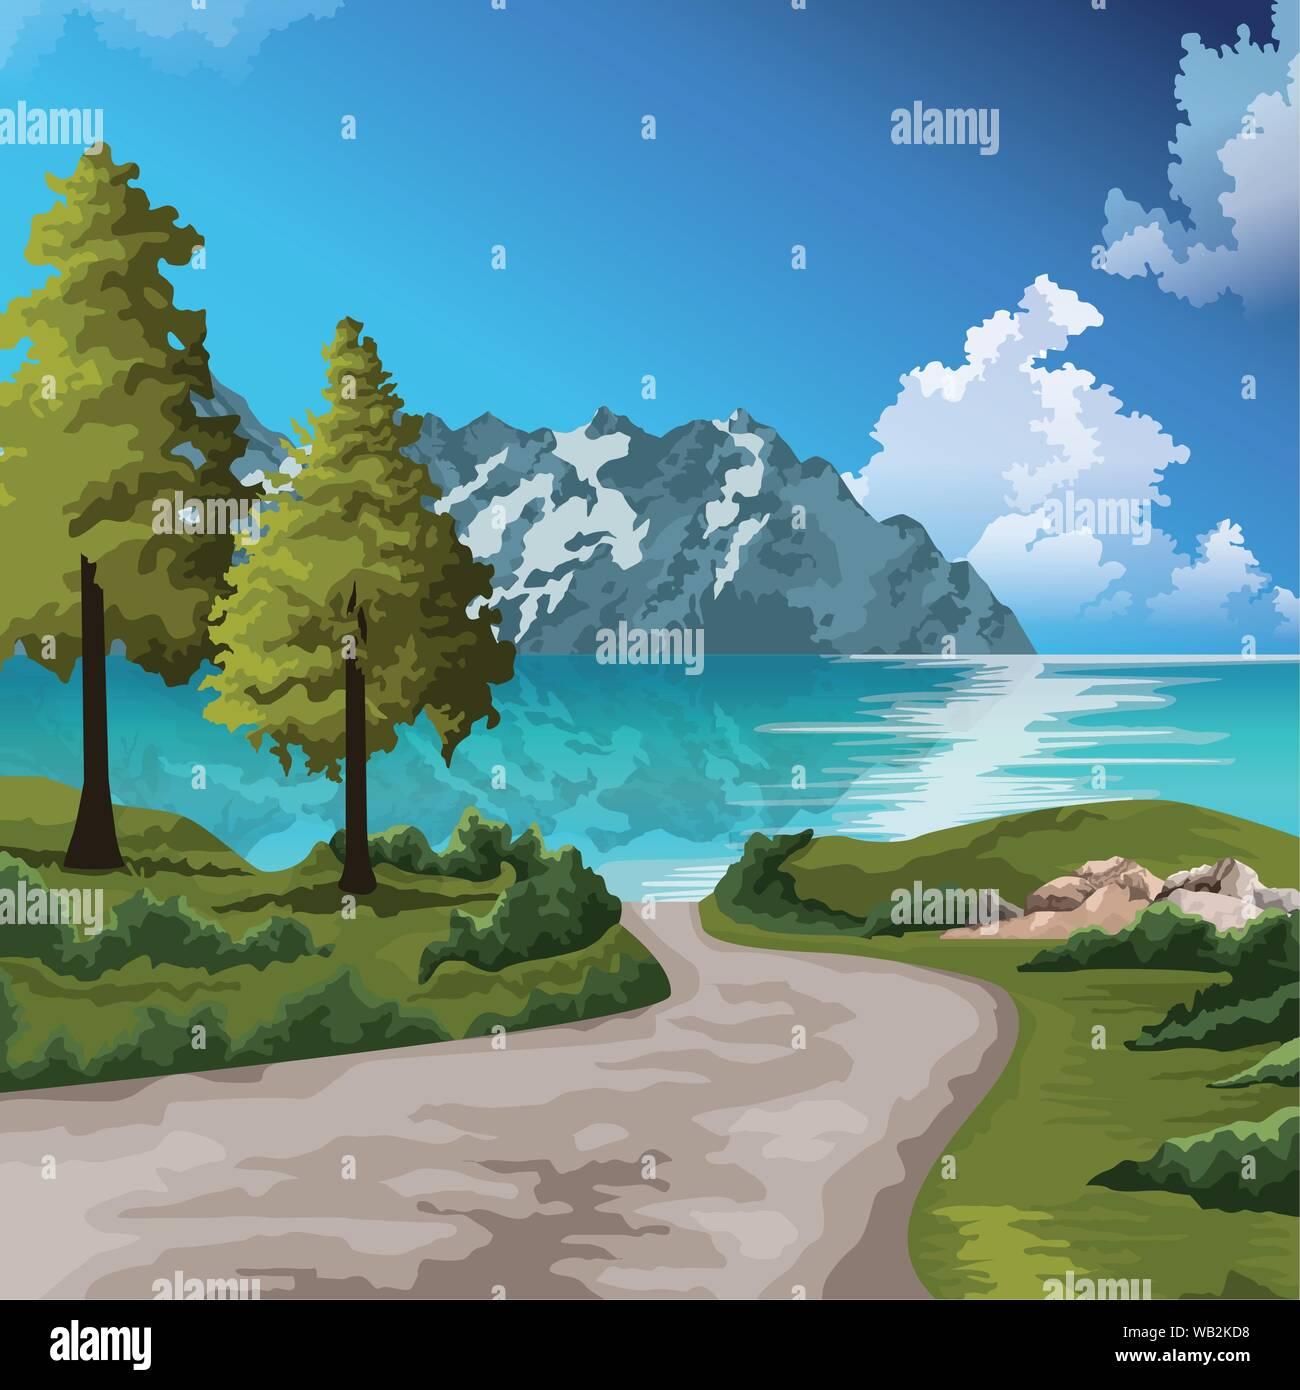 Beautiful Nature Landscape Drawing Scenery Stock Vector Image Art Alamy